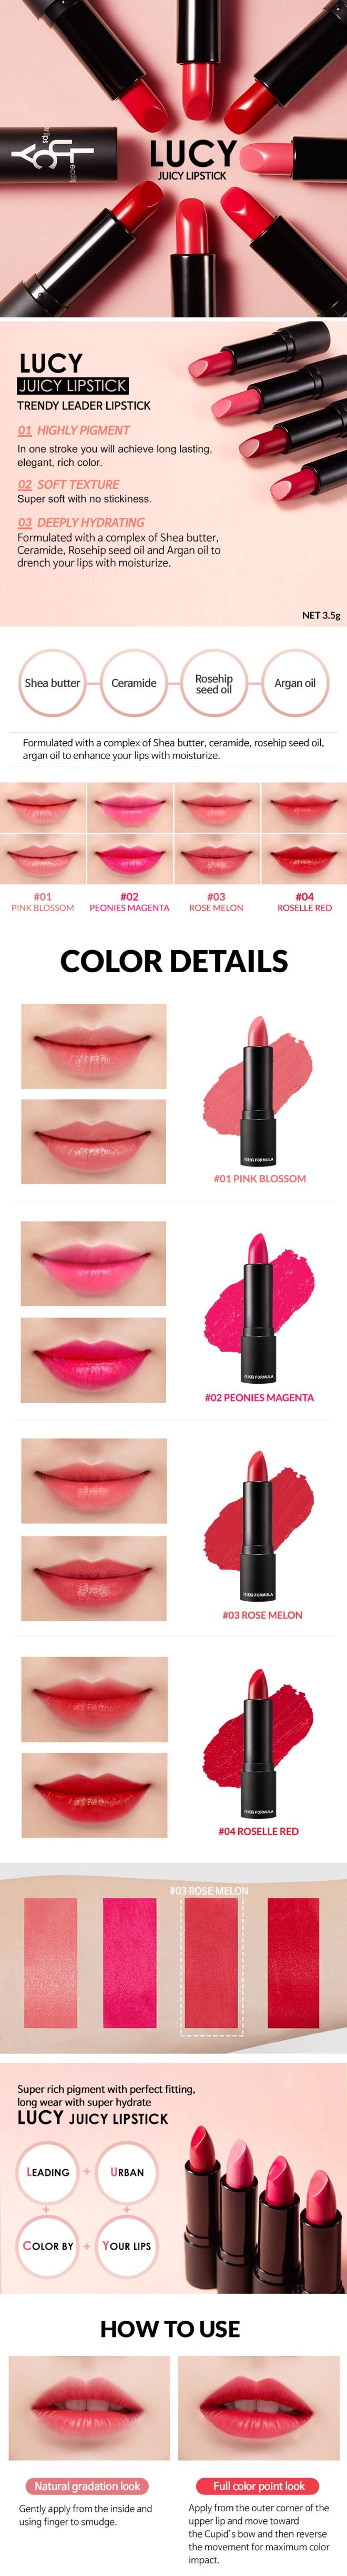 Lucy Juicy Lipstick (Info 01).jpg